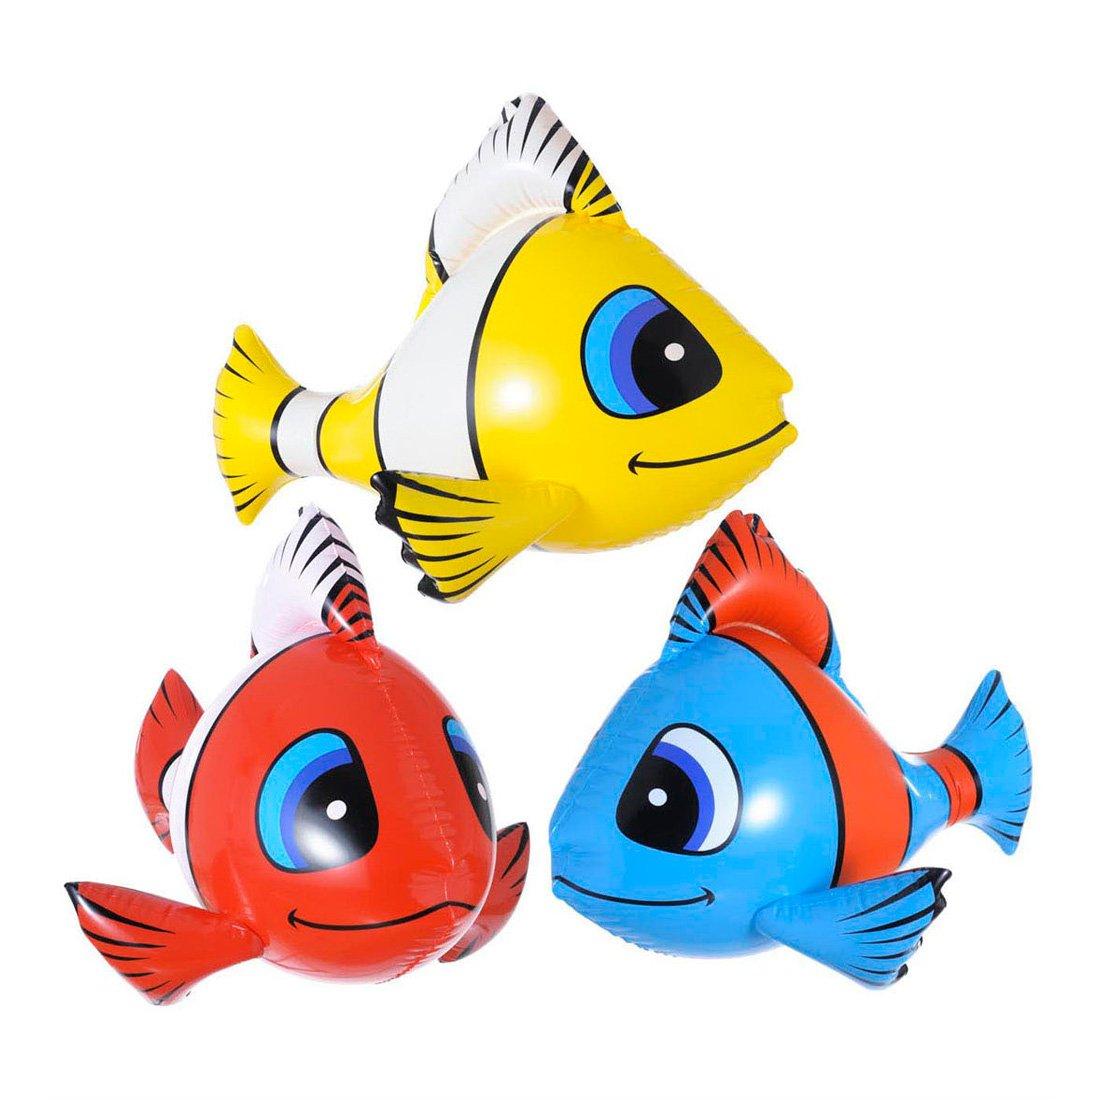 Riproduzione gonfiabile di pesce stile Nemo decorazioni gonfiabili per party in maschera 60cm